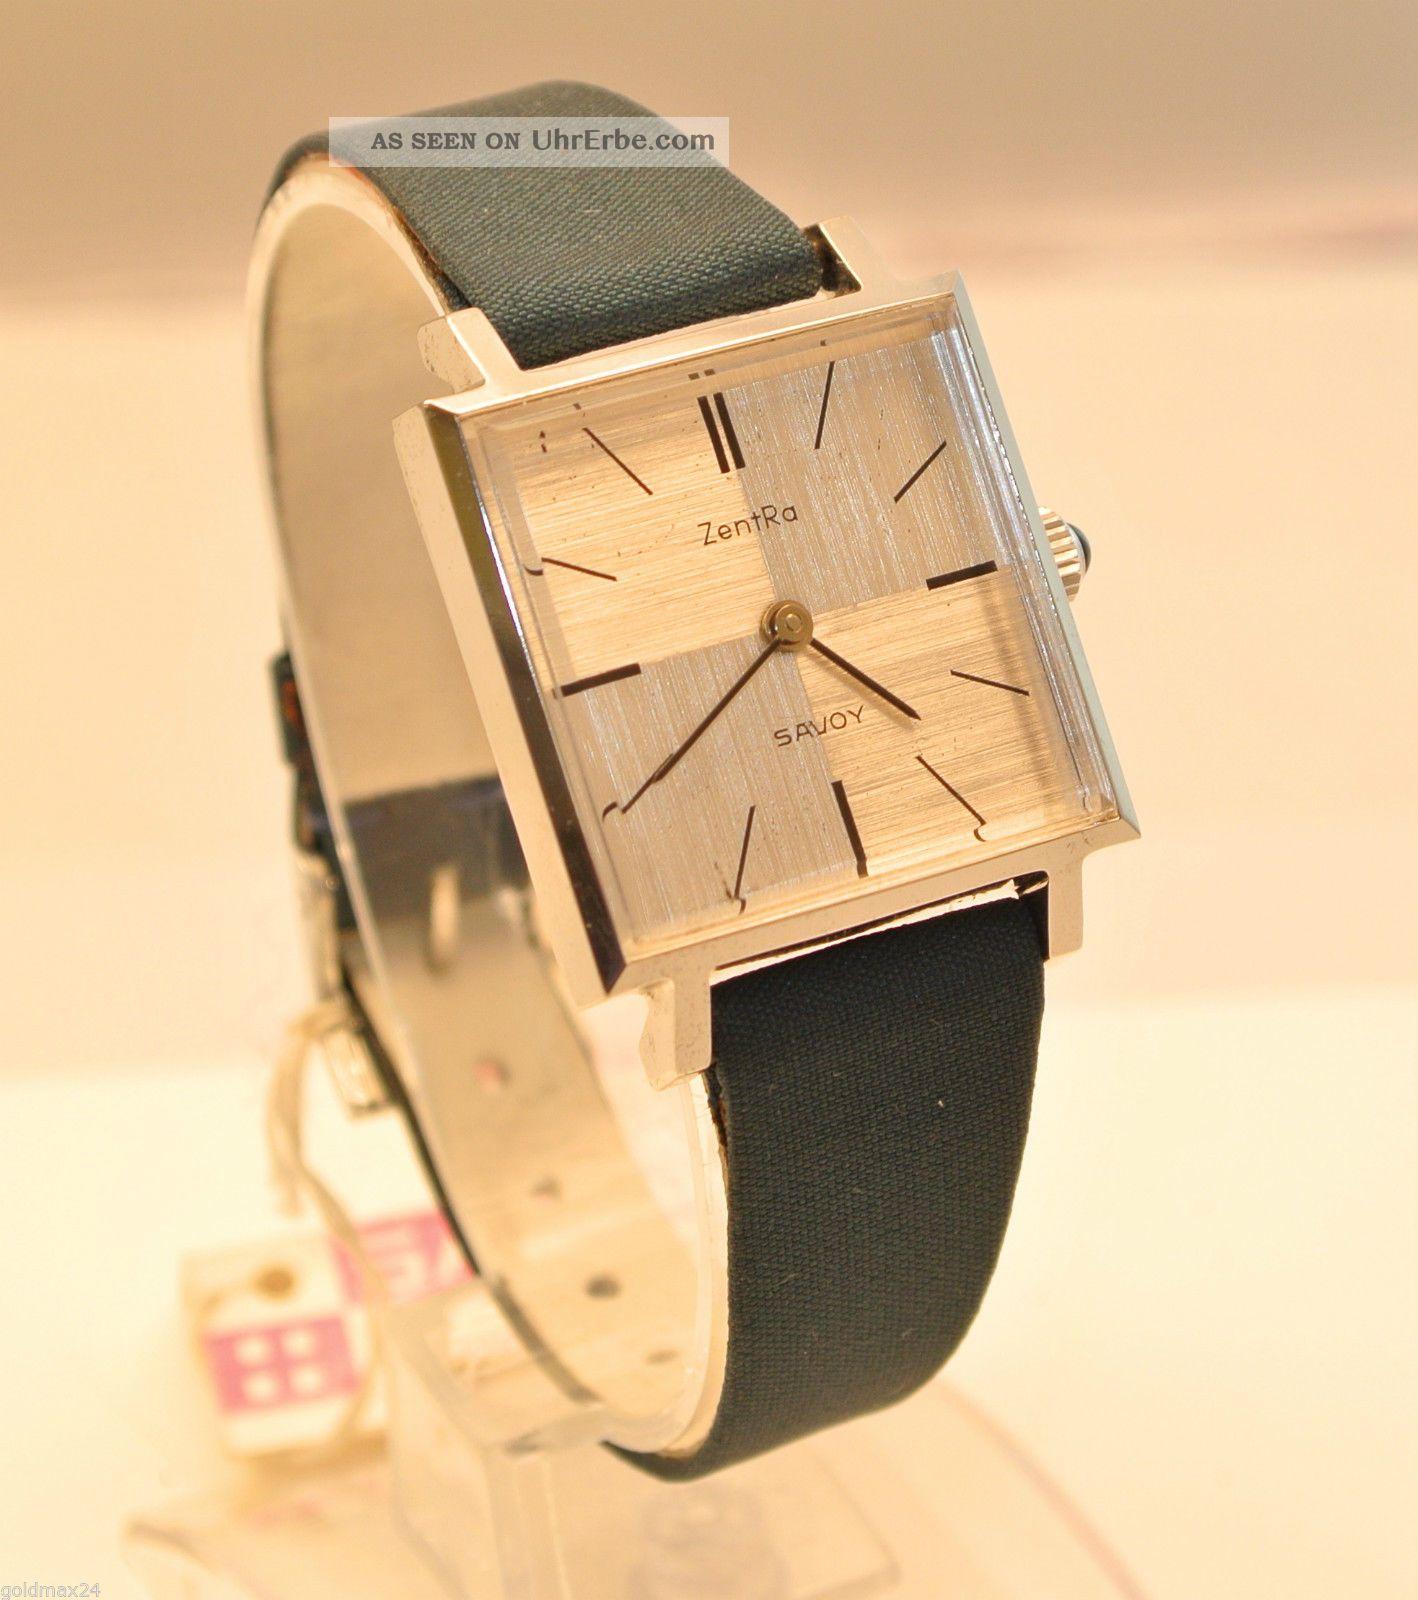 Zent Ra Savoy - Damenarmbanduhr / Handaufzug Armbanduhren Bild